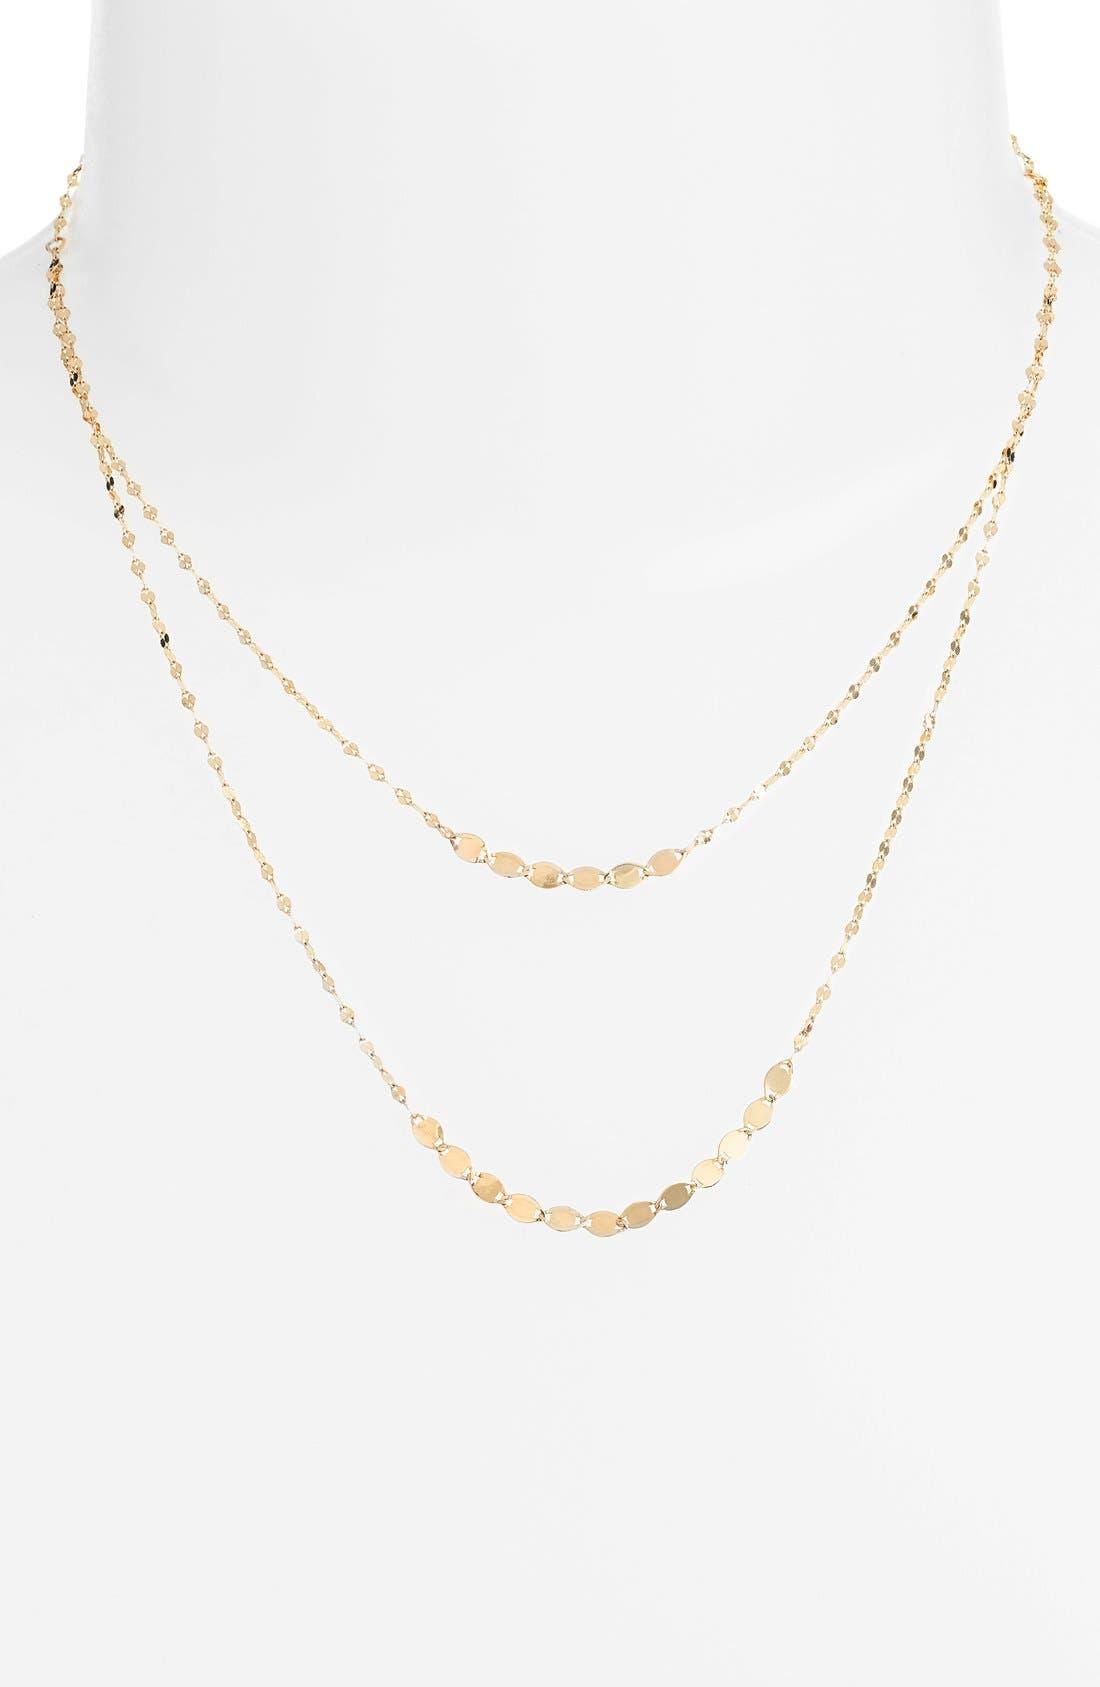 Main Image - Lana Jewelry 'Nude Duo' Multistrand Necklace